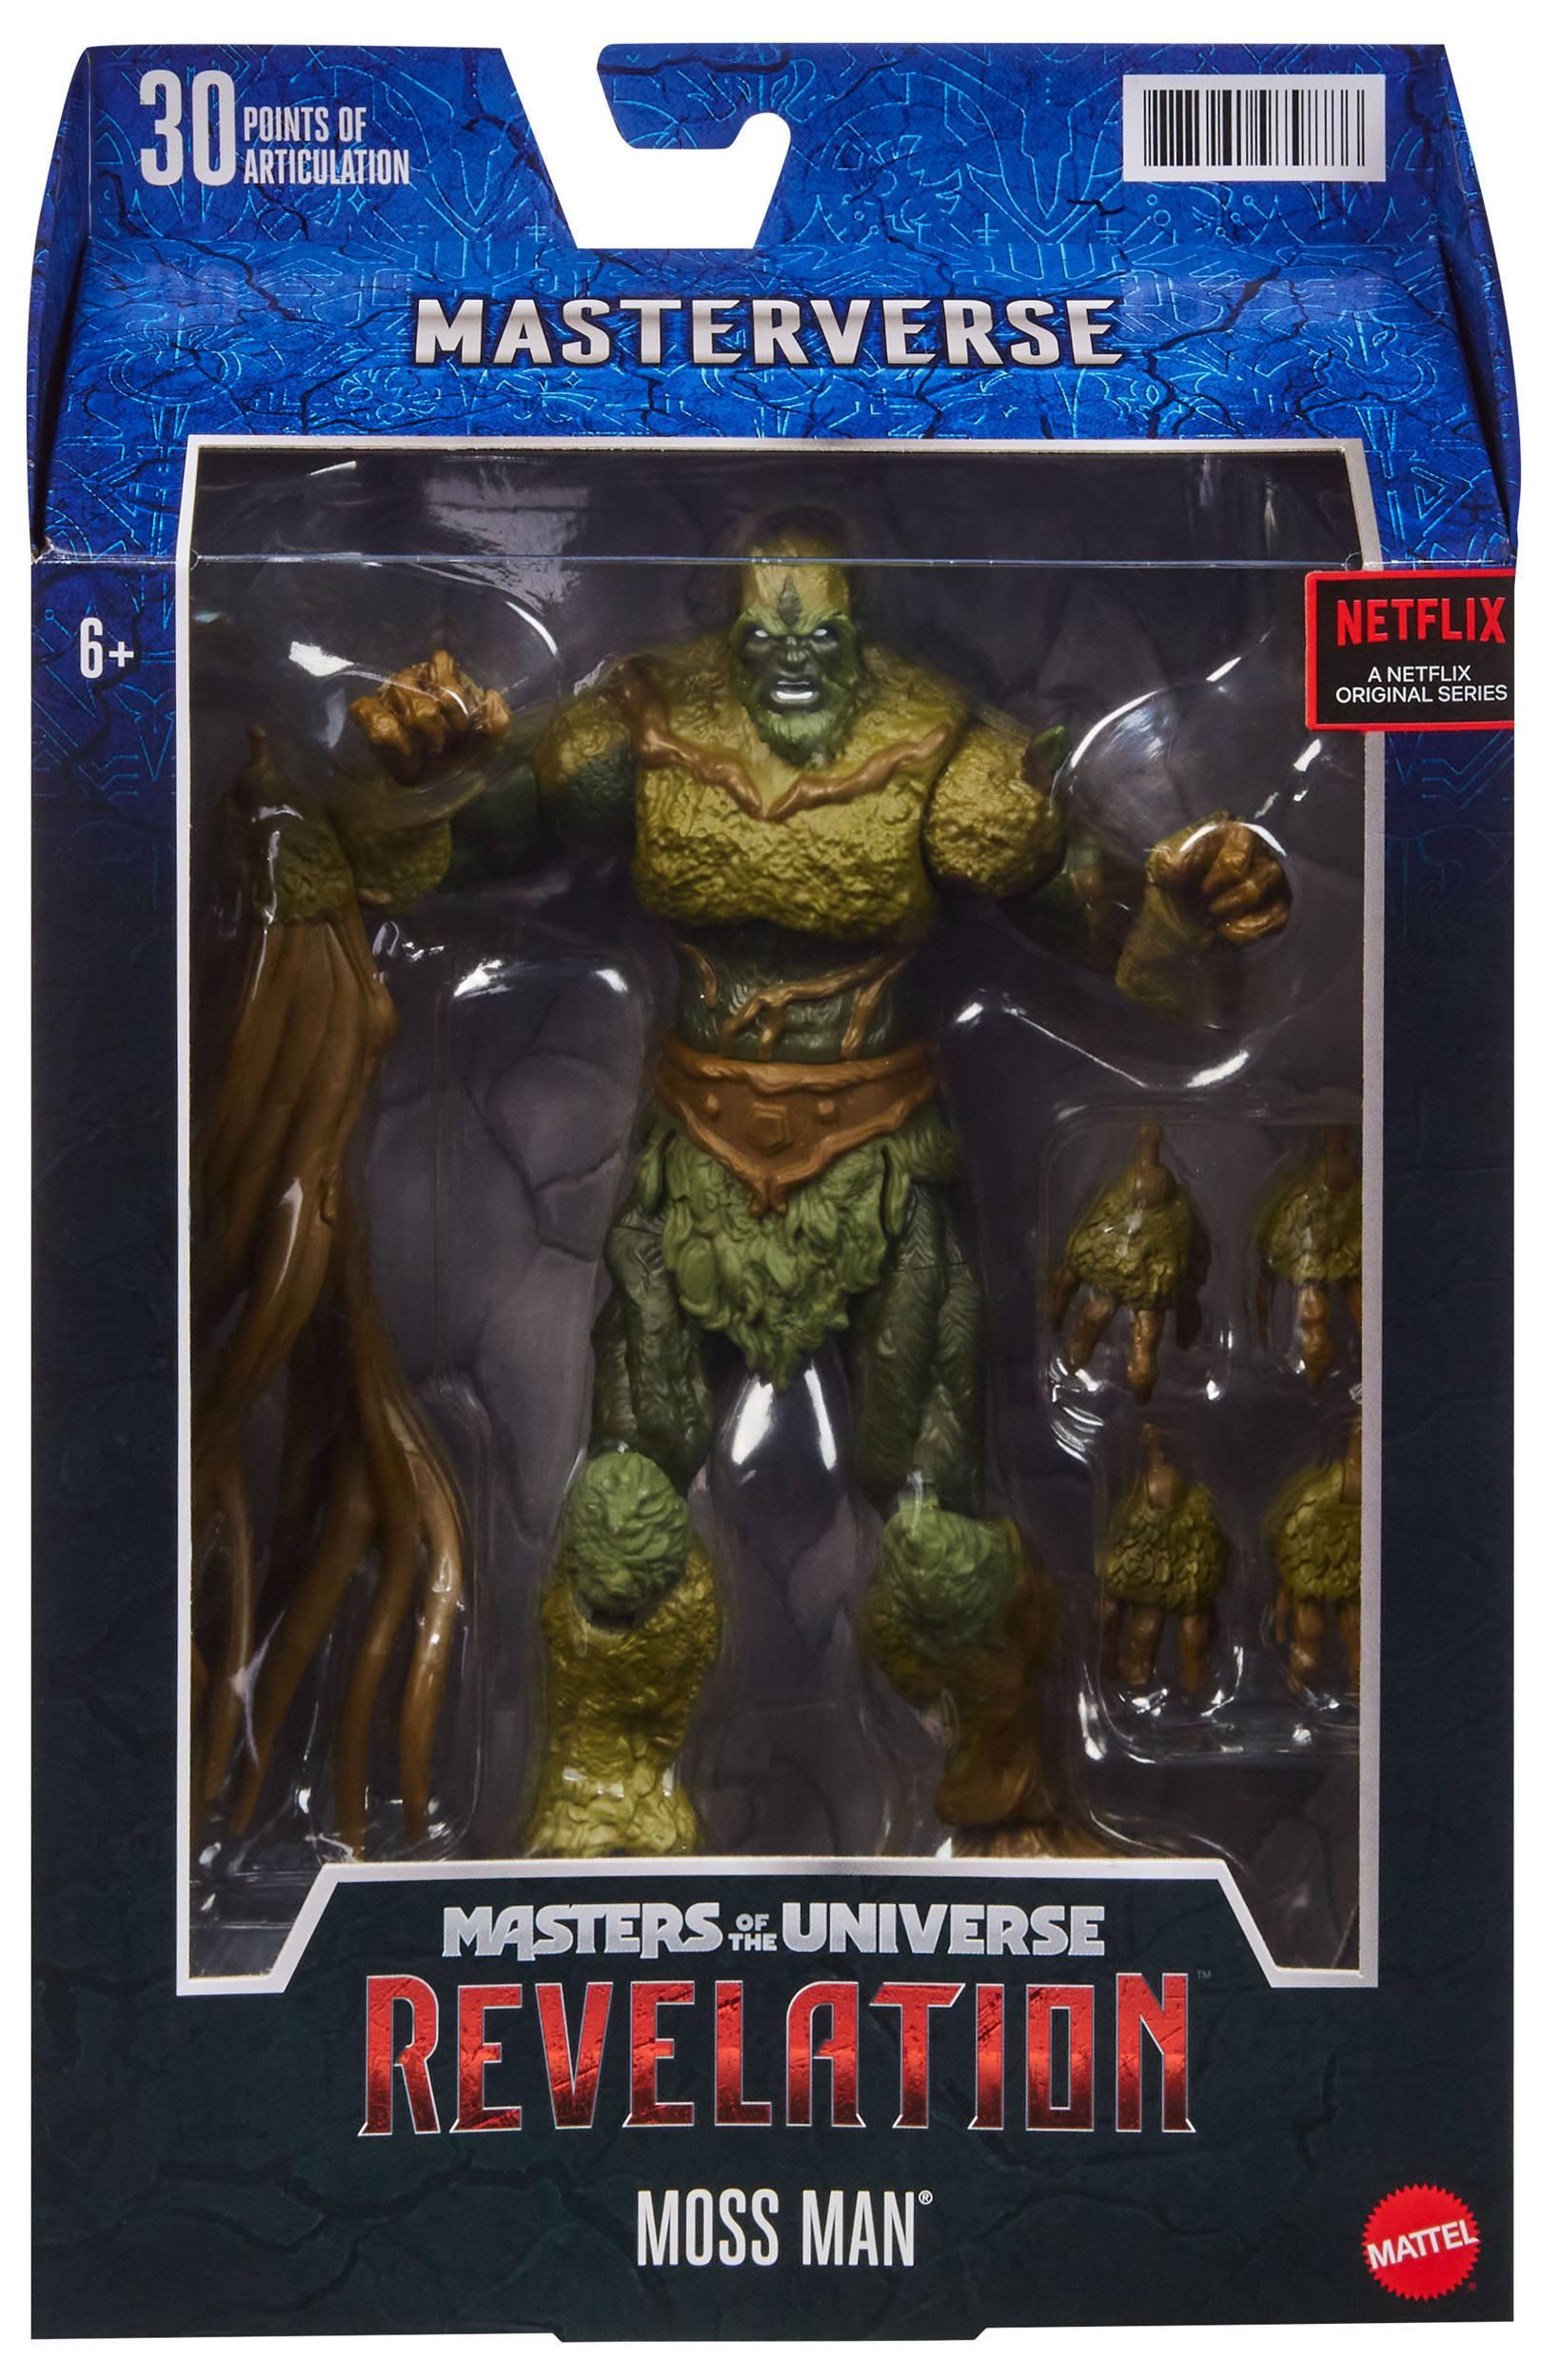 Masters of the Universe: Revelation Masterverse Actionfigur 2021 Moss Man 18 cm MATTGYV11 0887961979886